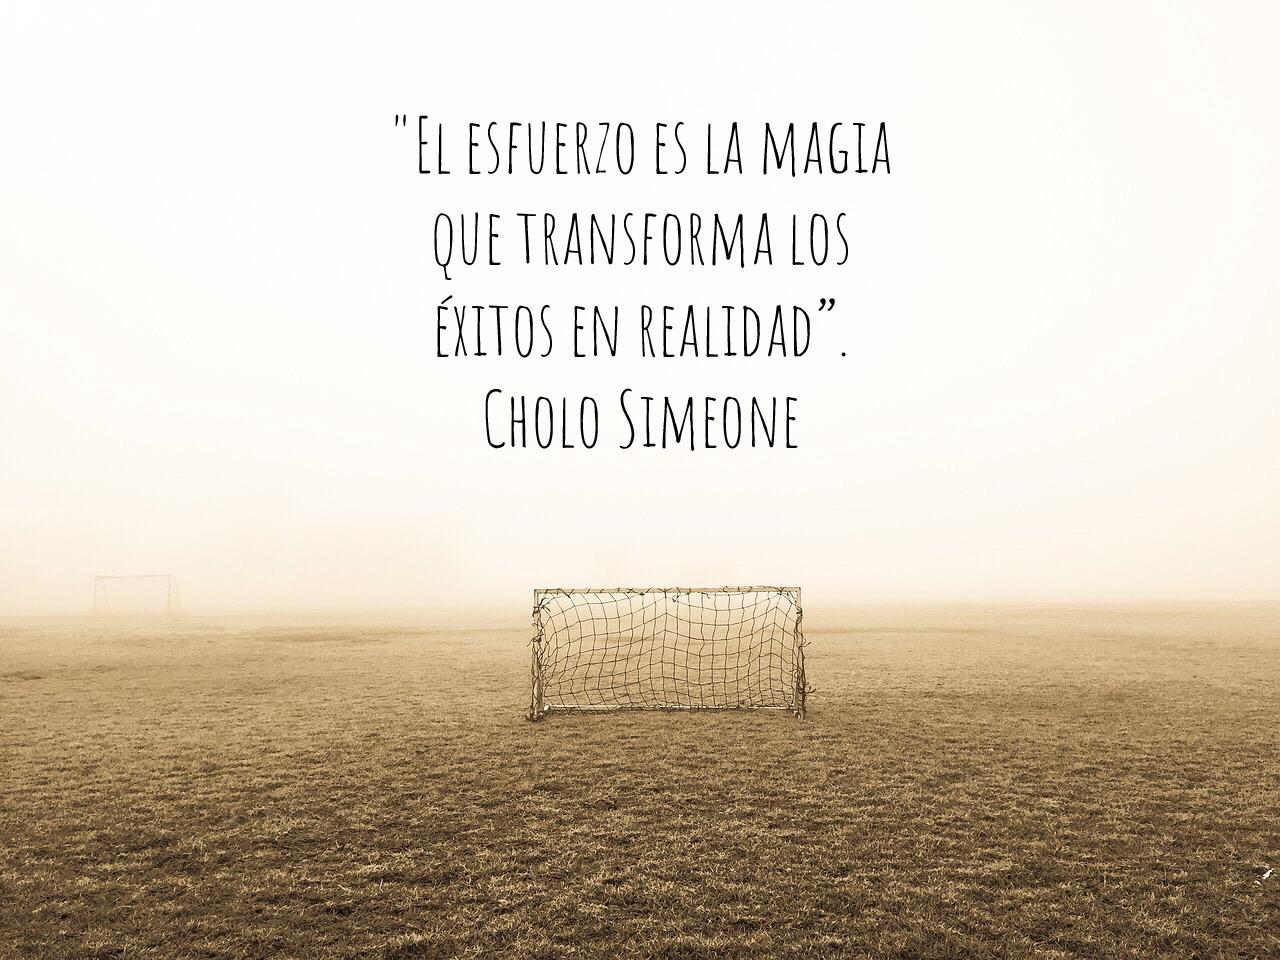 Las 50 Mejores Frases De Fútbol Para Motivar Revolución